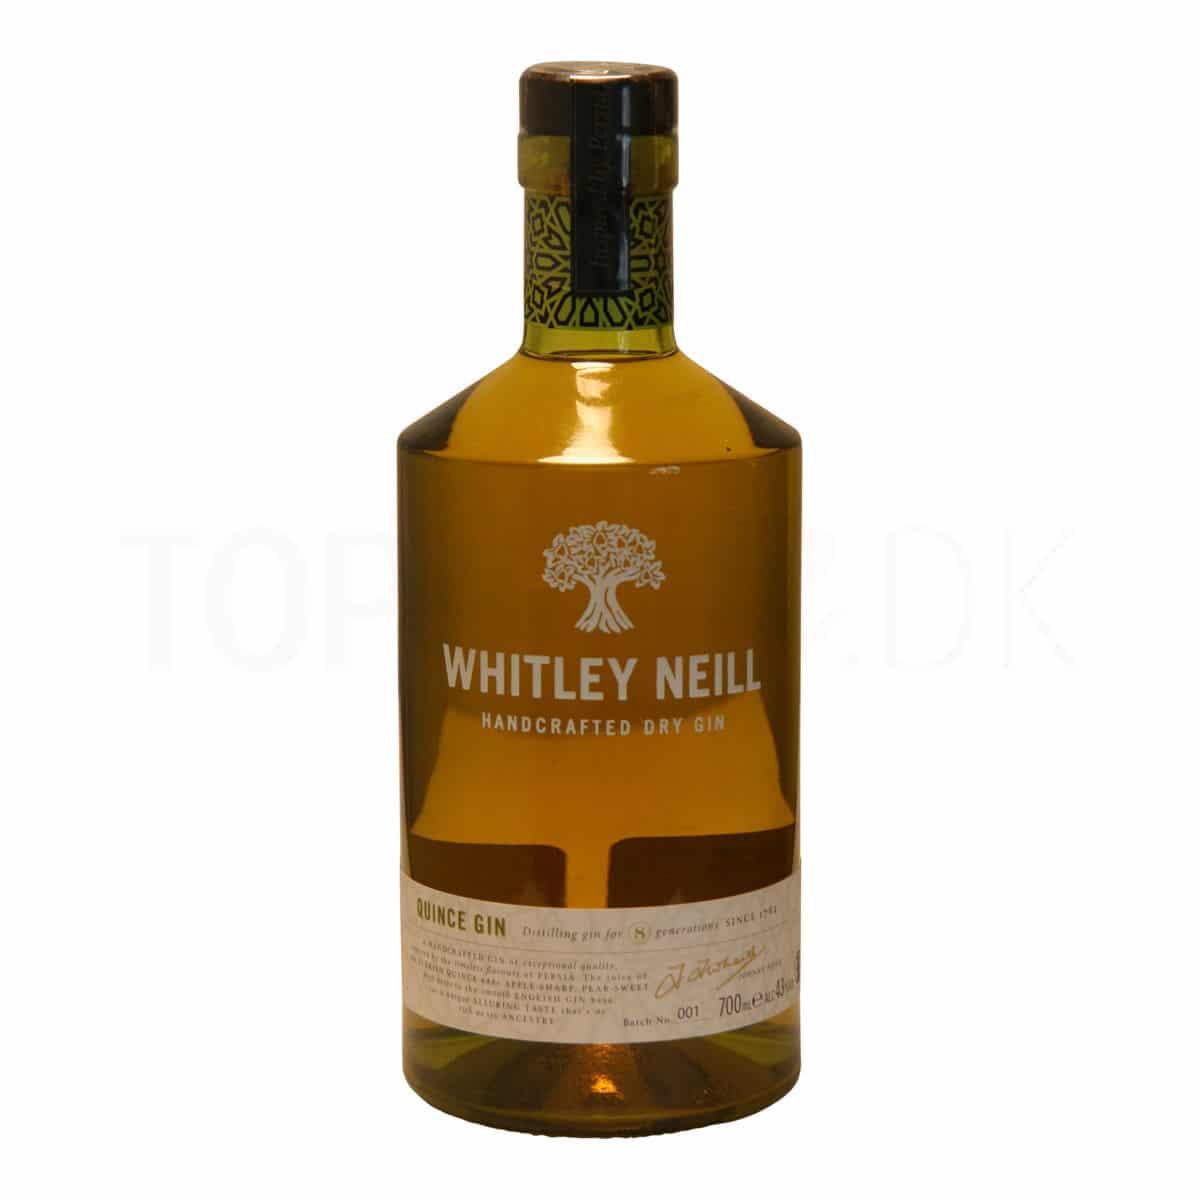 Topvine Whitley Neill kvaede gin